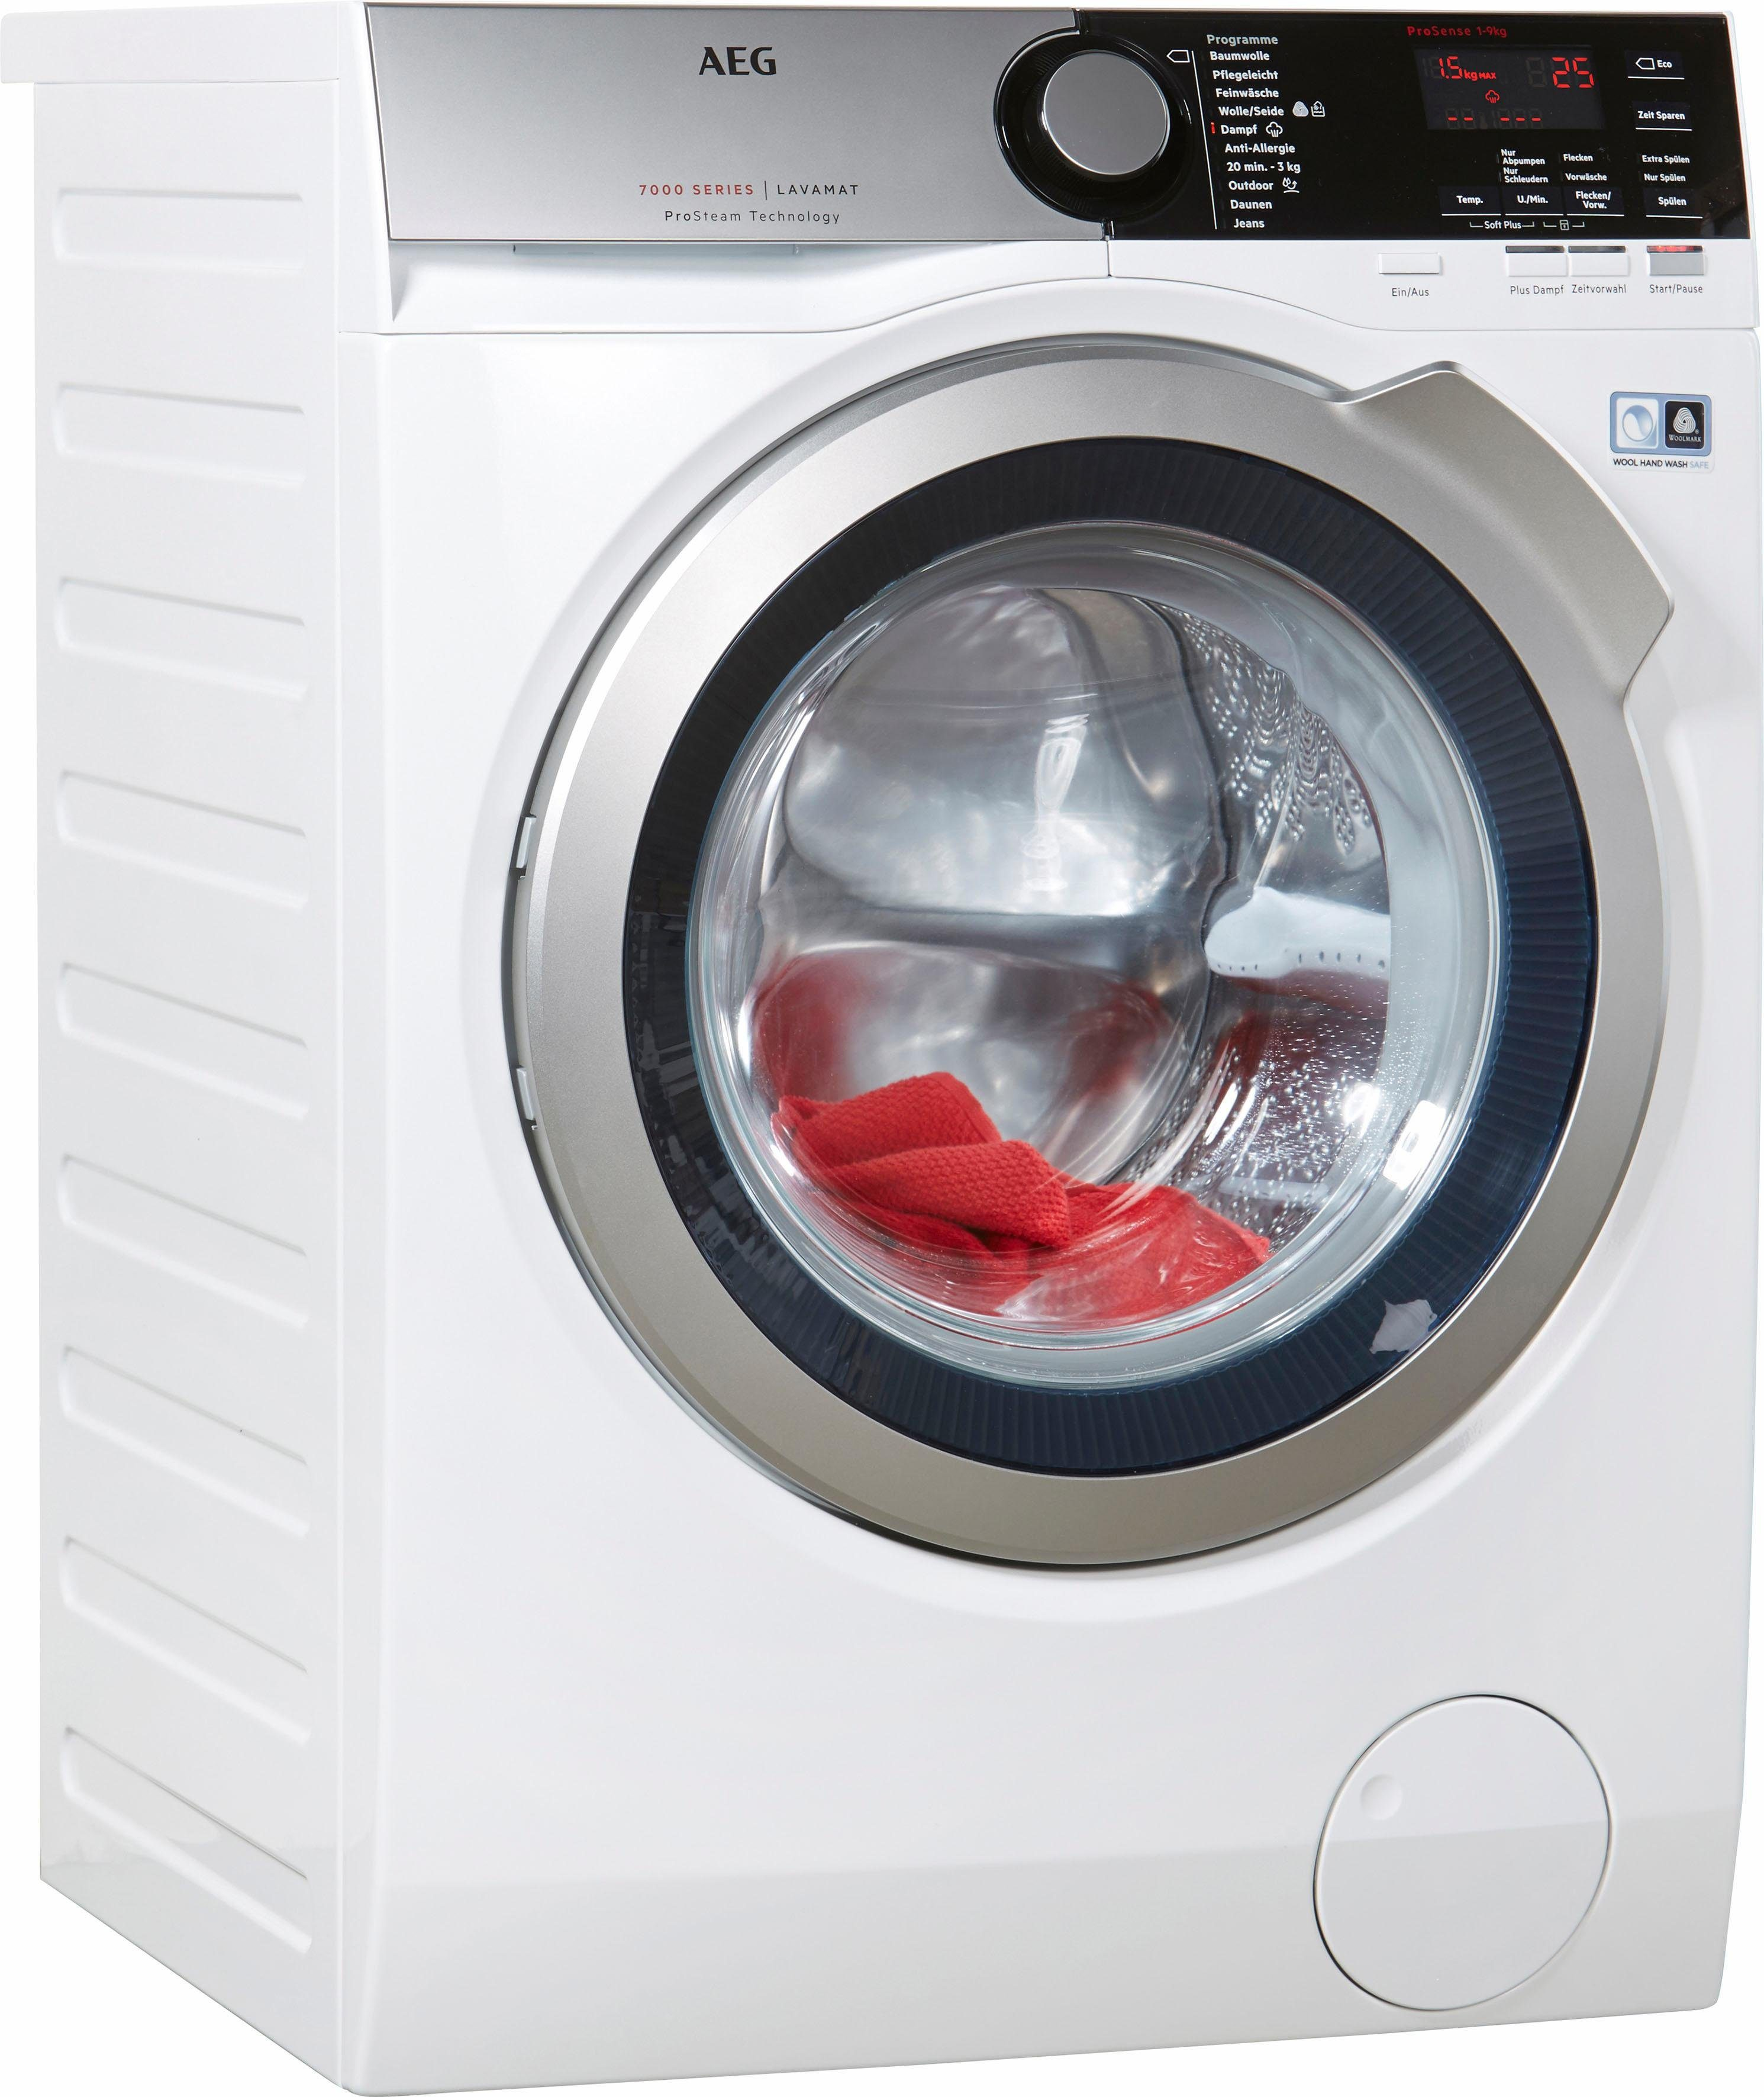 AEG Waschmaschine LAVAMAT L7FE76695, A+++, 9 kg, 1600 U/Min